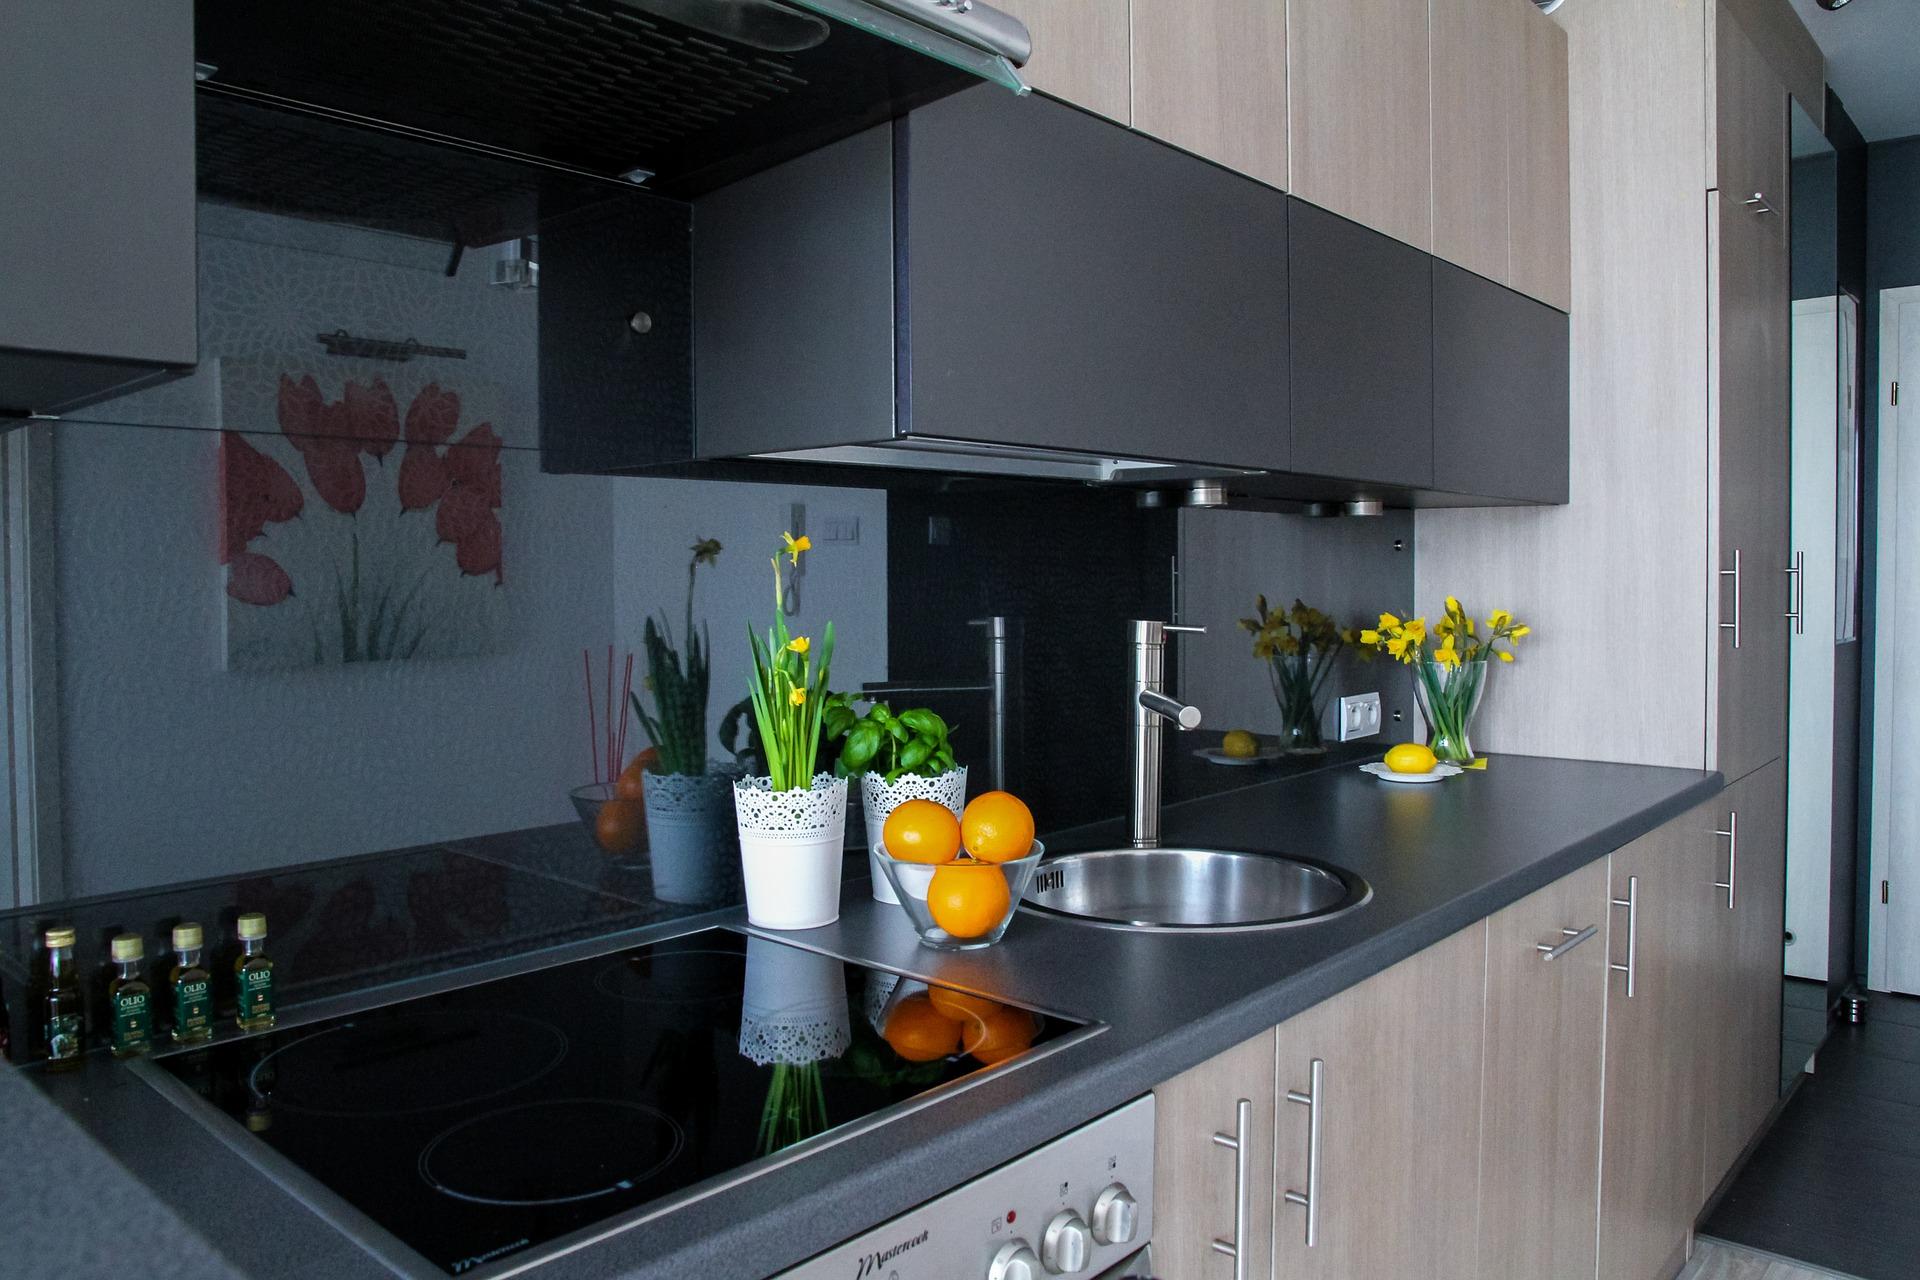 Kitchen Renovation Glass Backsplash Aeh Glass Construction